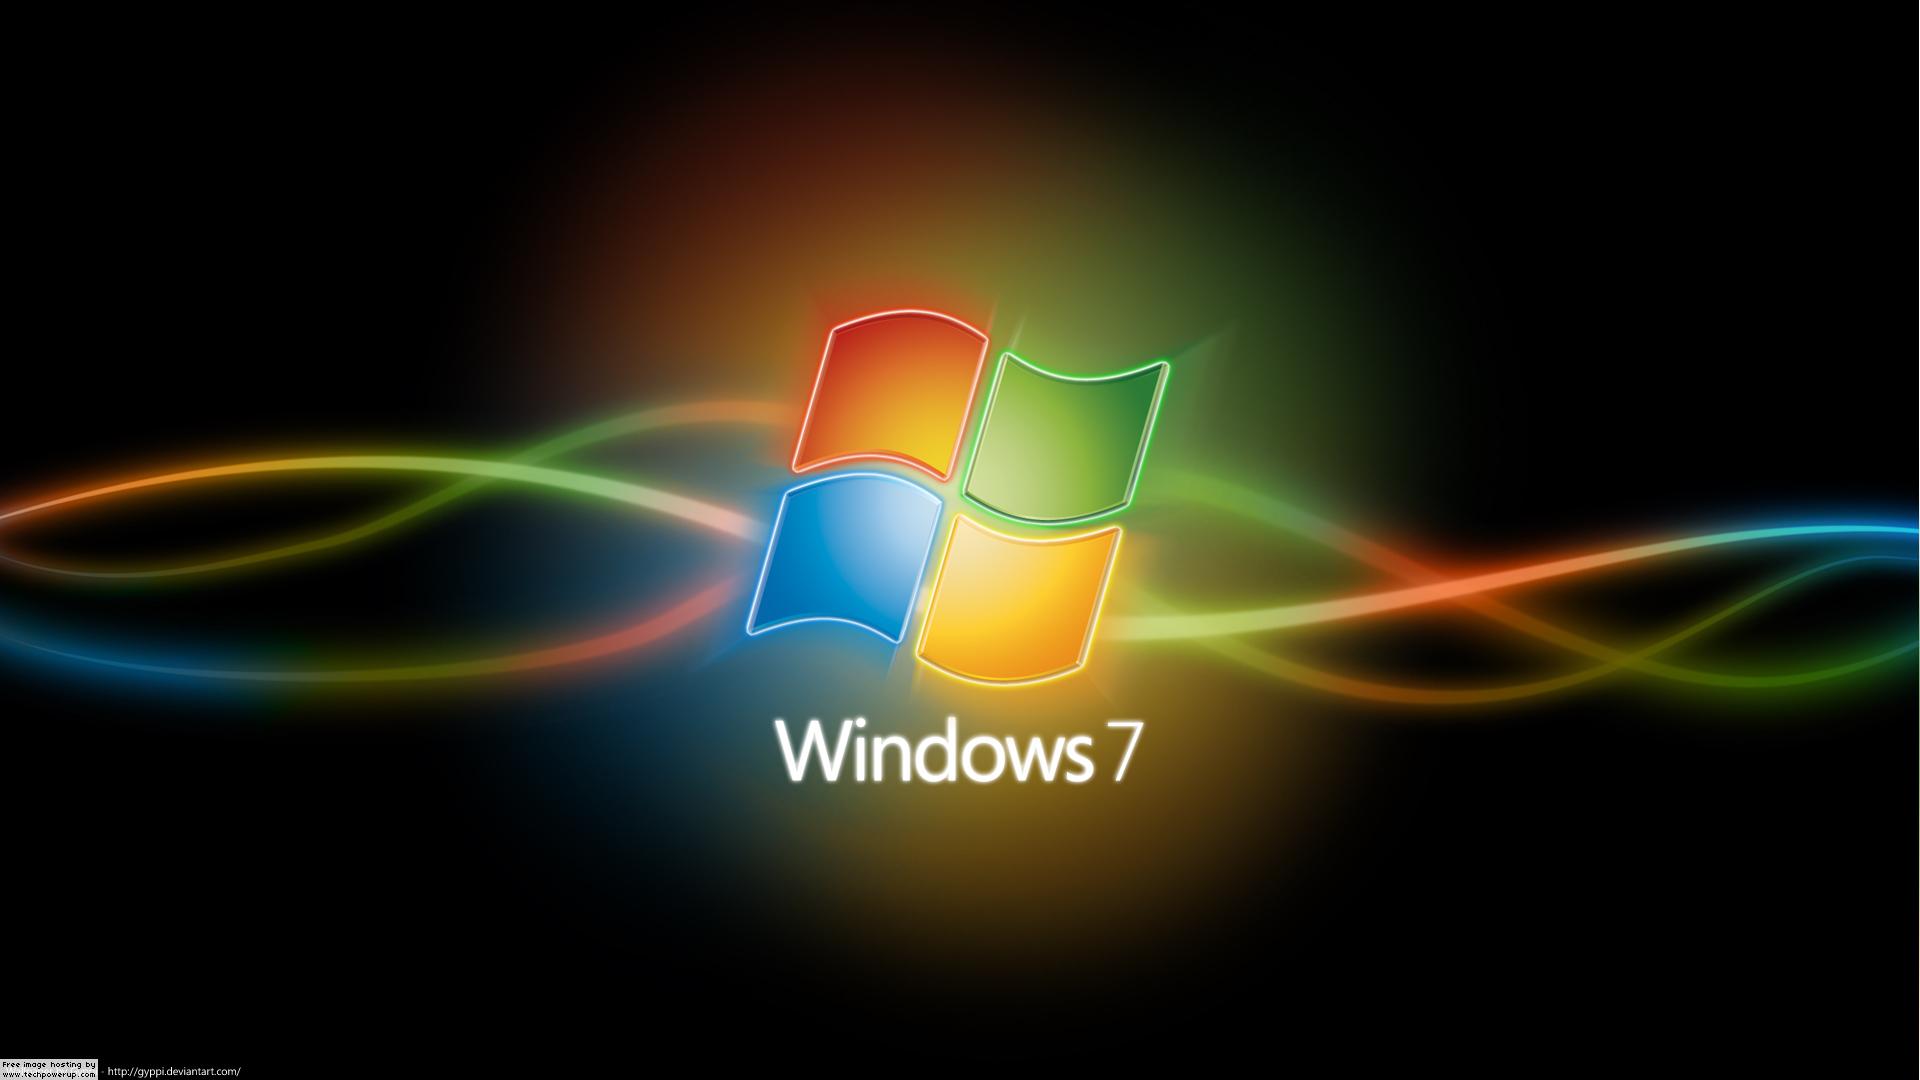 Windows 7 Wallpaper Hd 1080P 6752 1920x1080